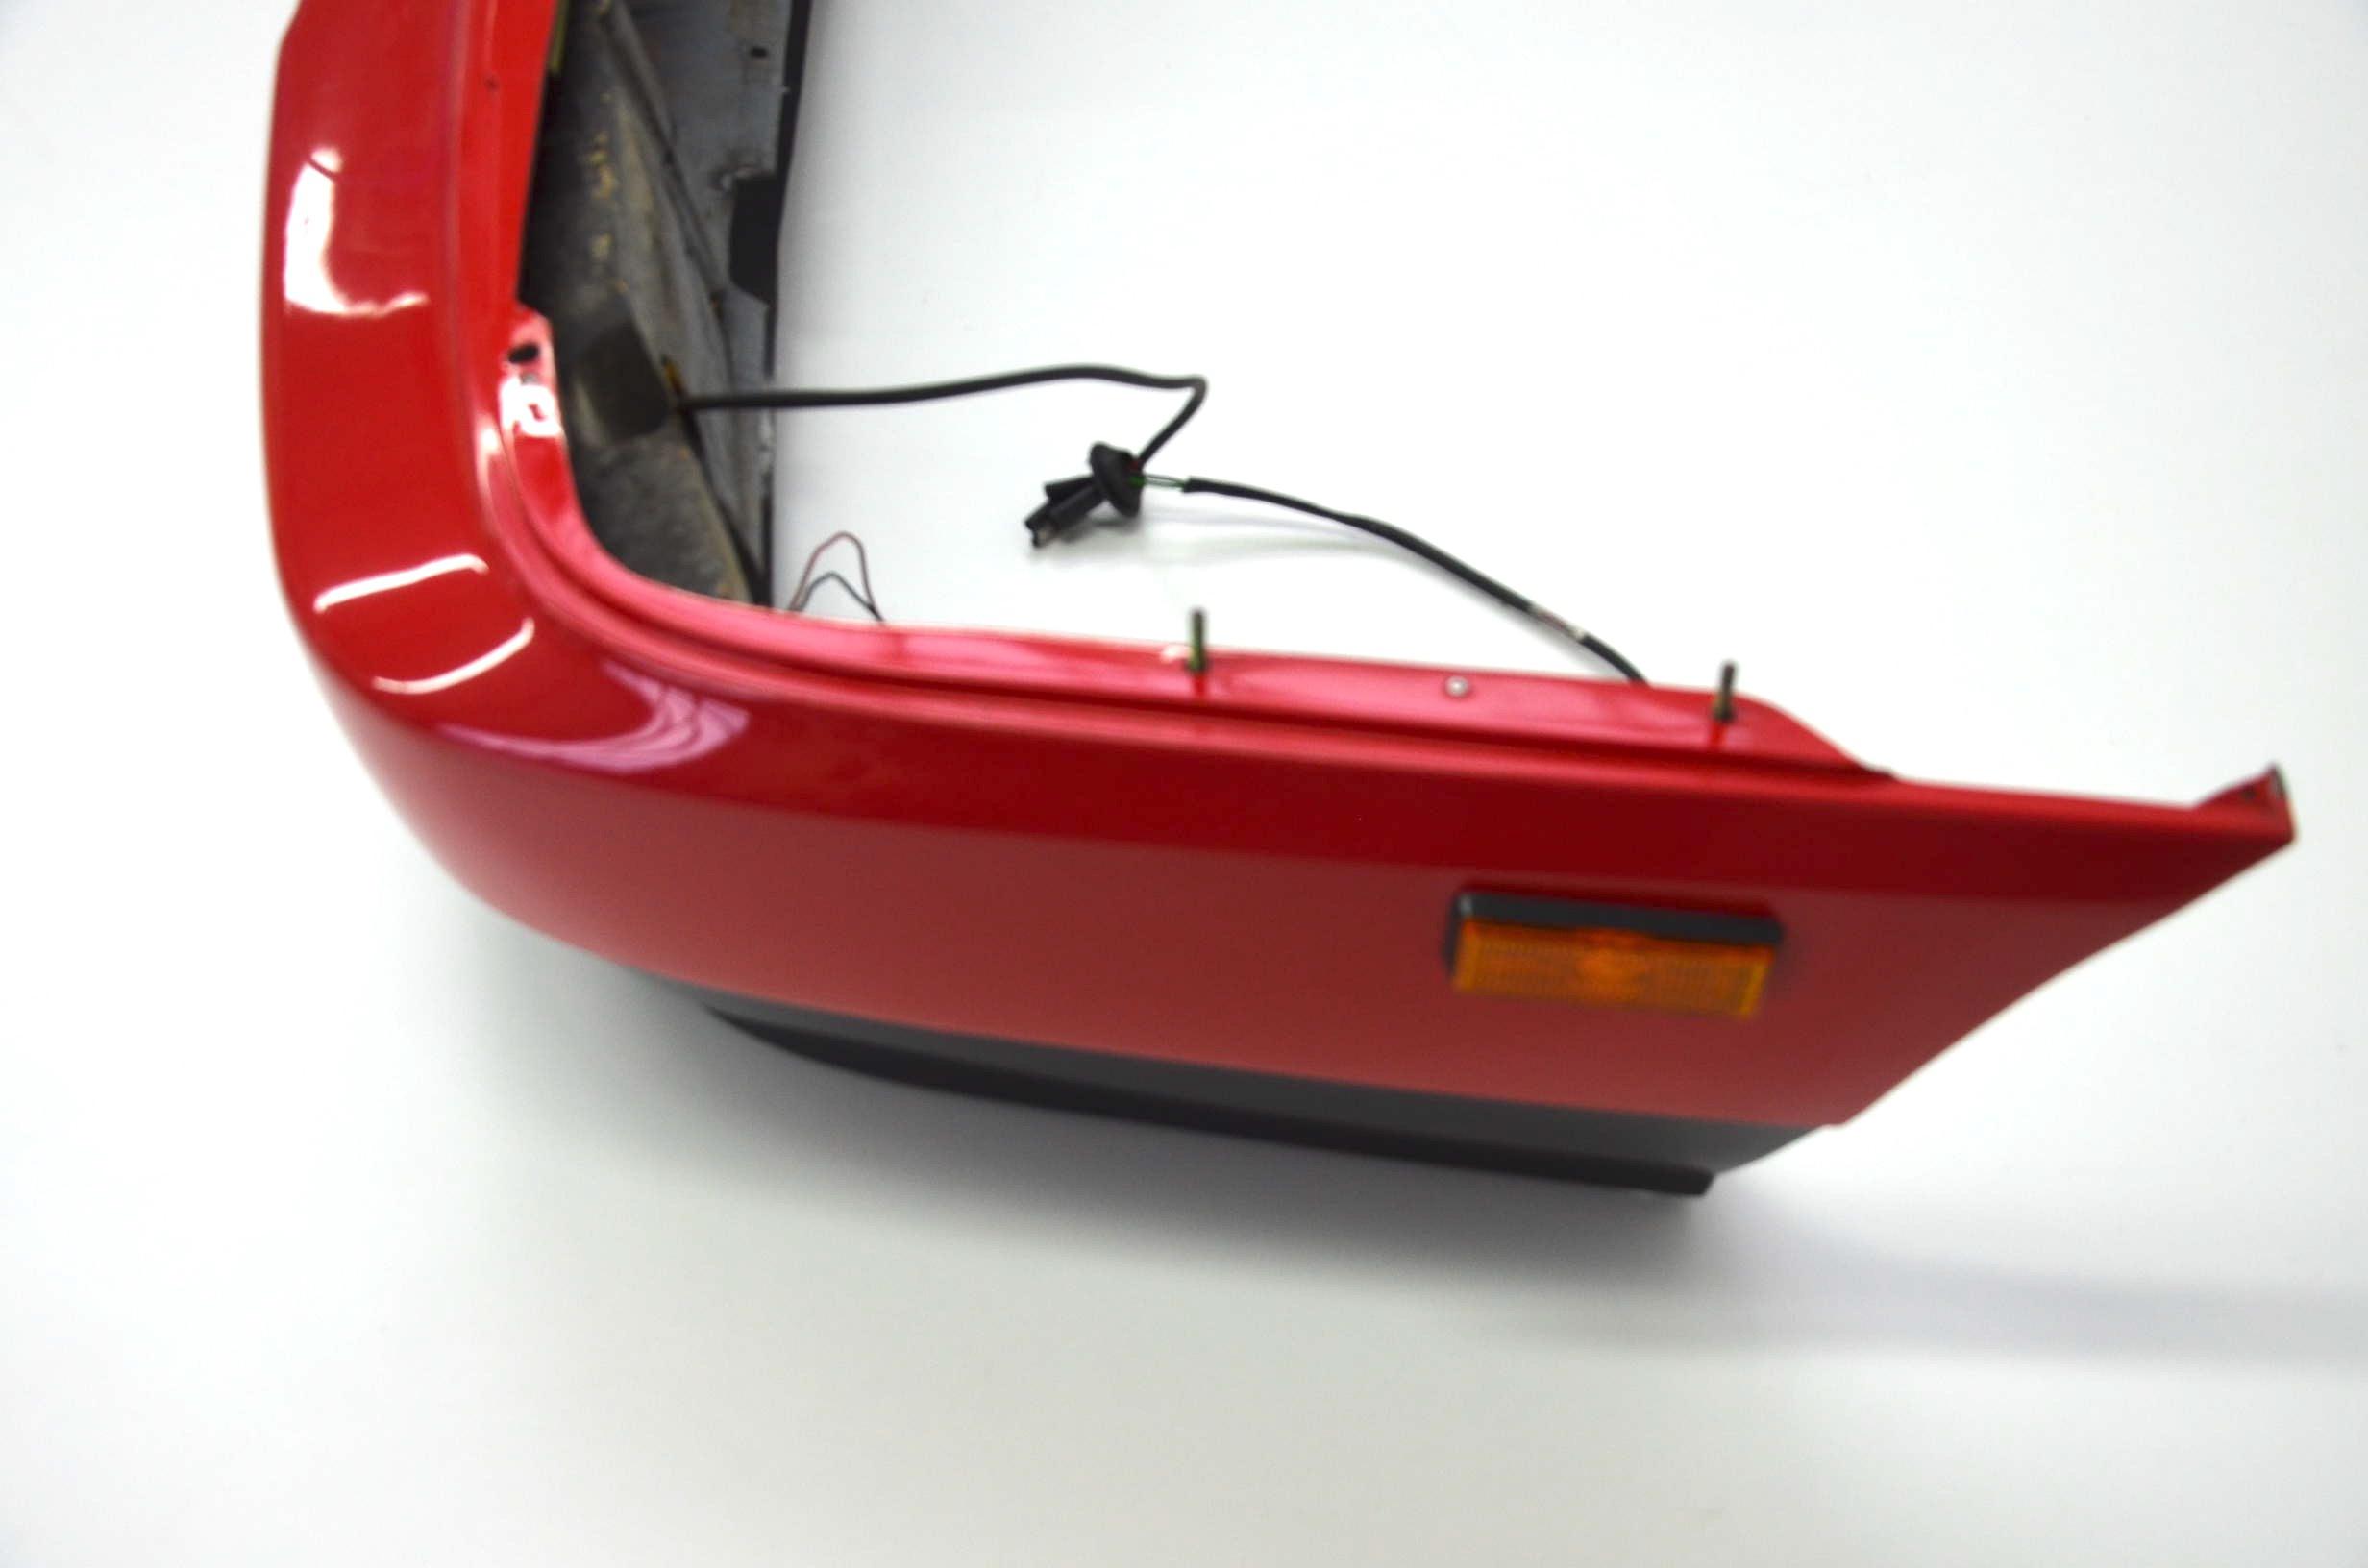 service manual 1985 lotus esprit rear bumper removal. Black Bedroom Furniture Sets. Home Design Ideas